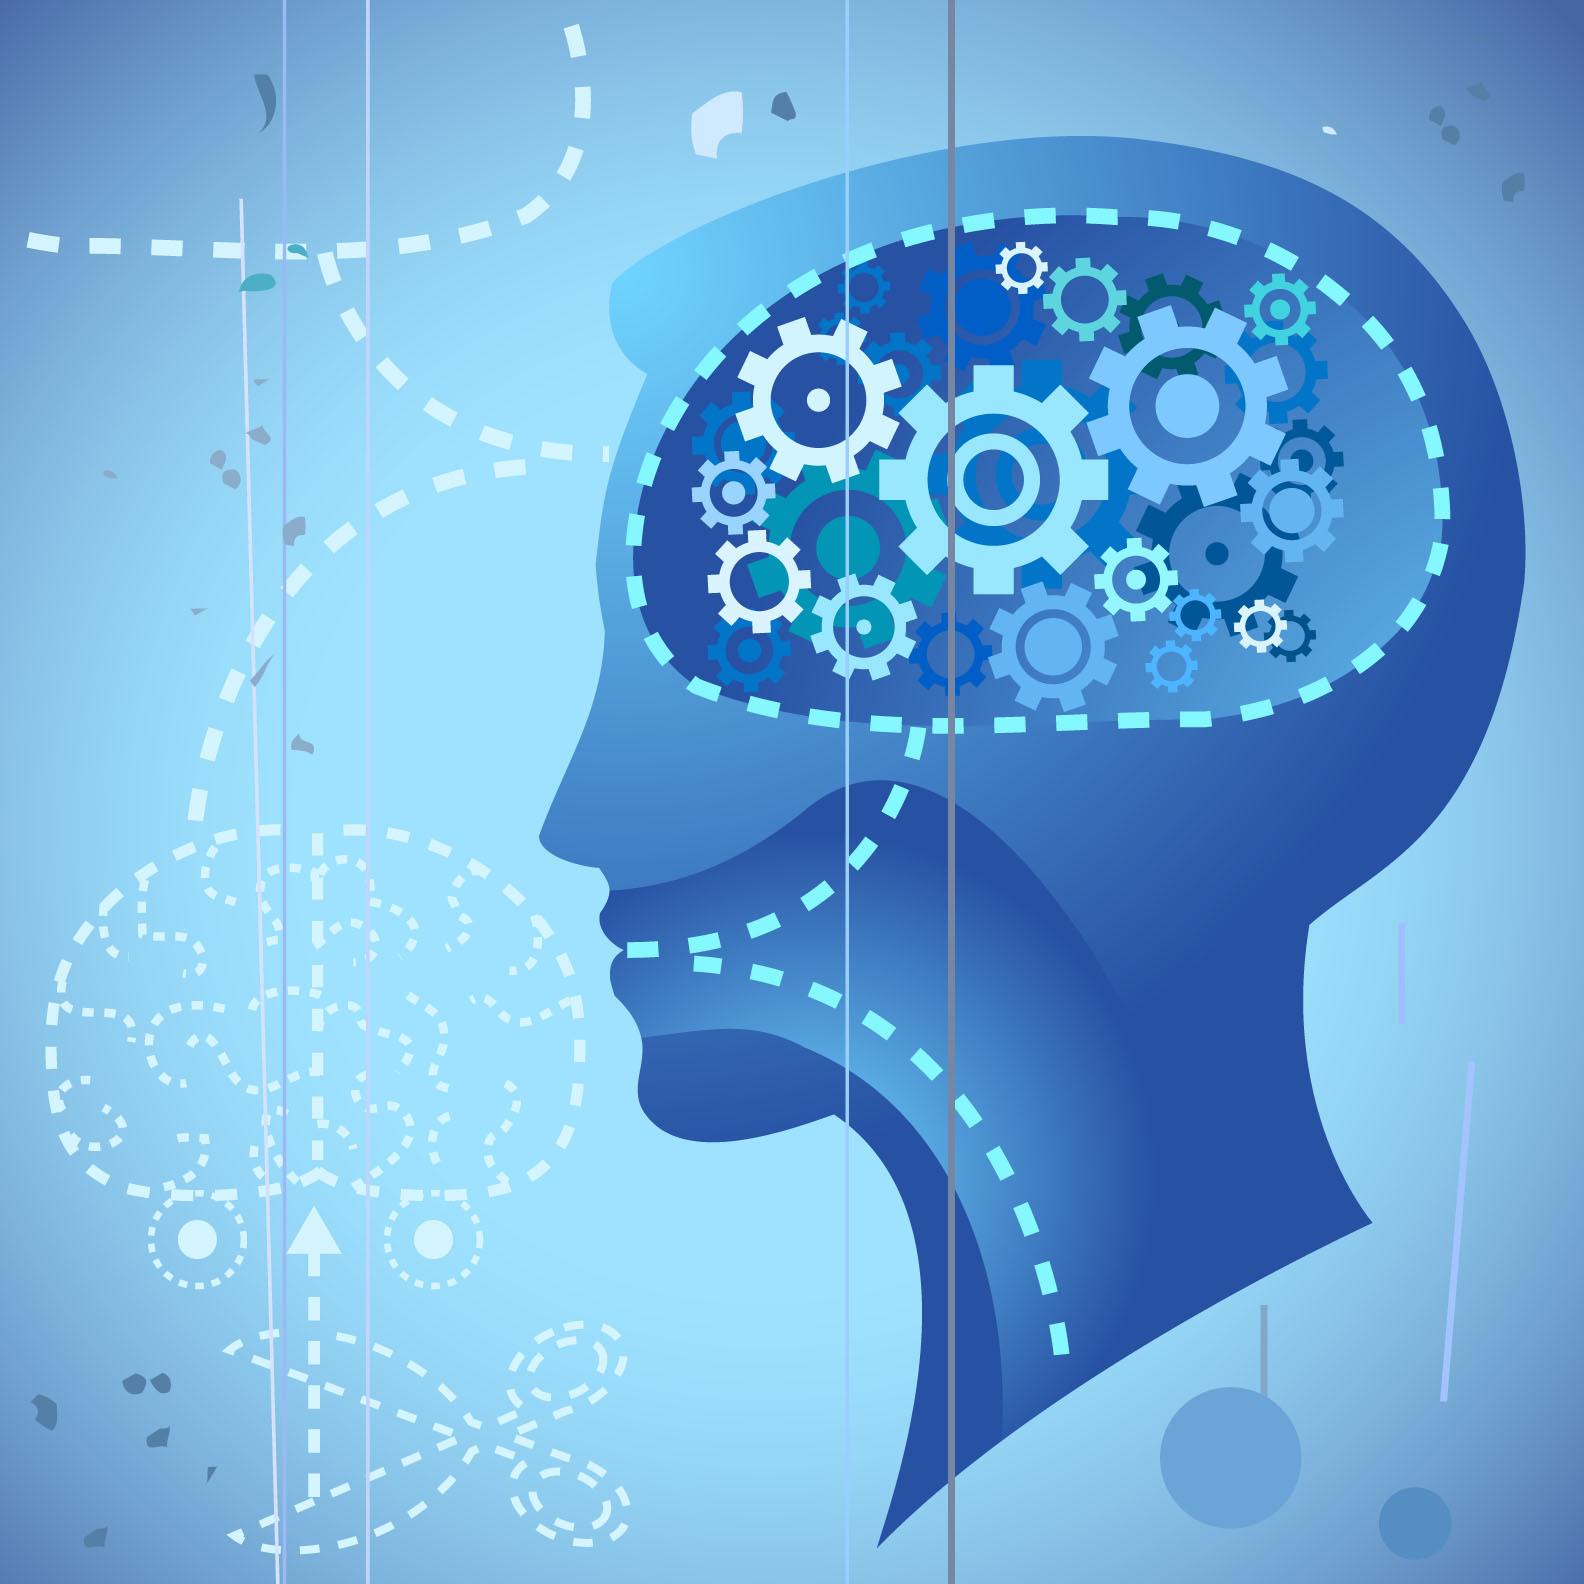 subconscious thinking process